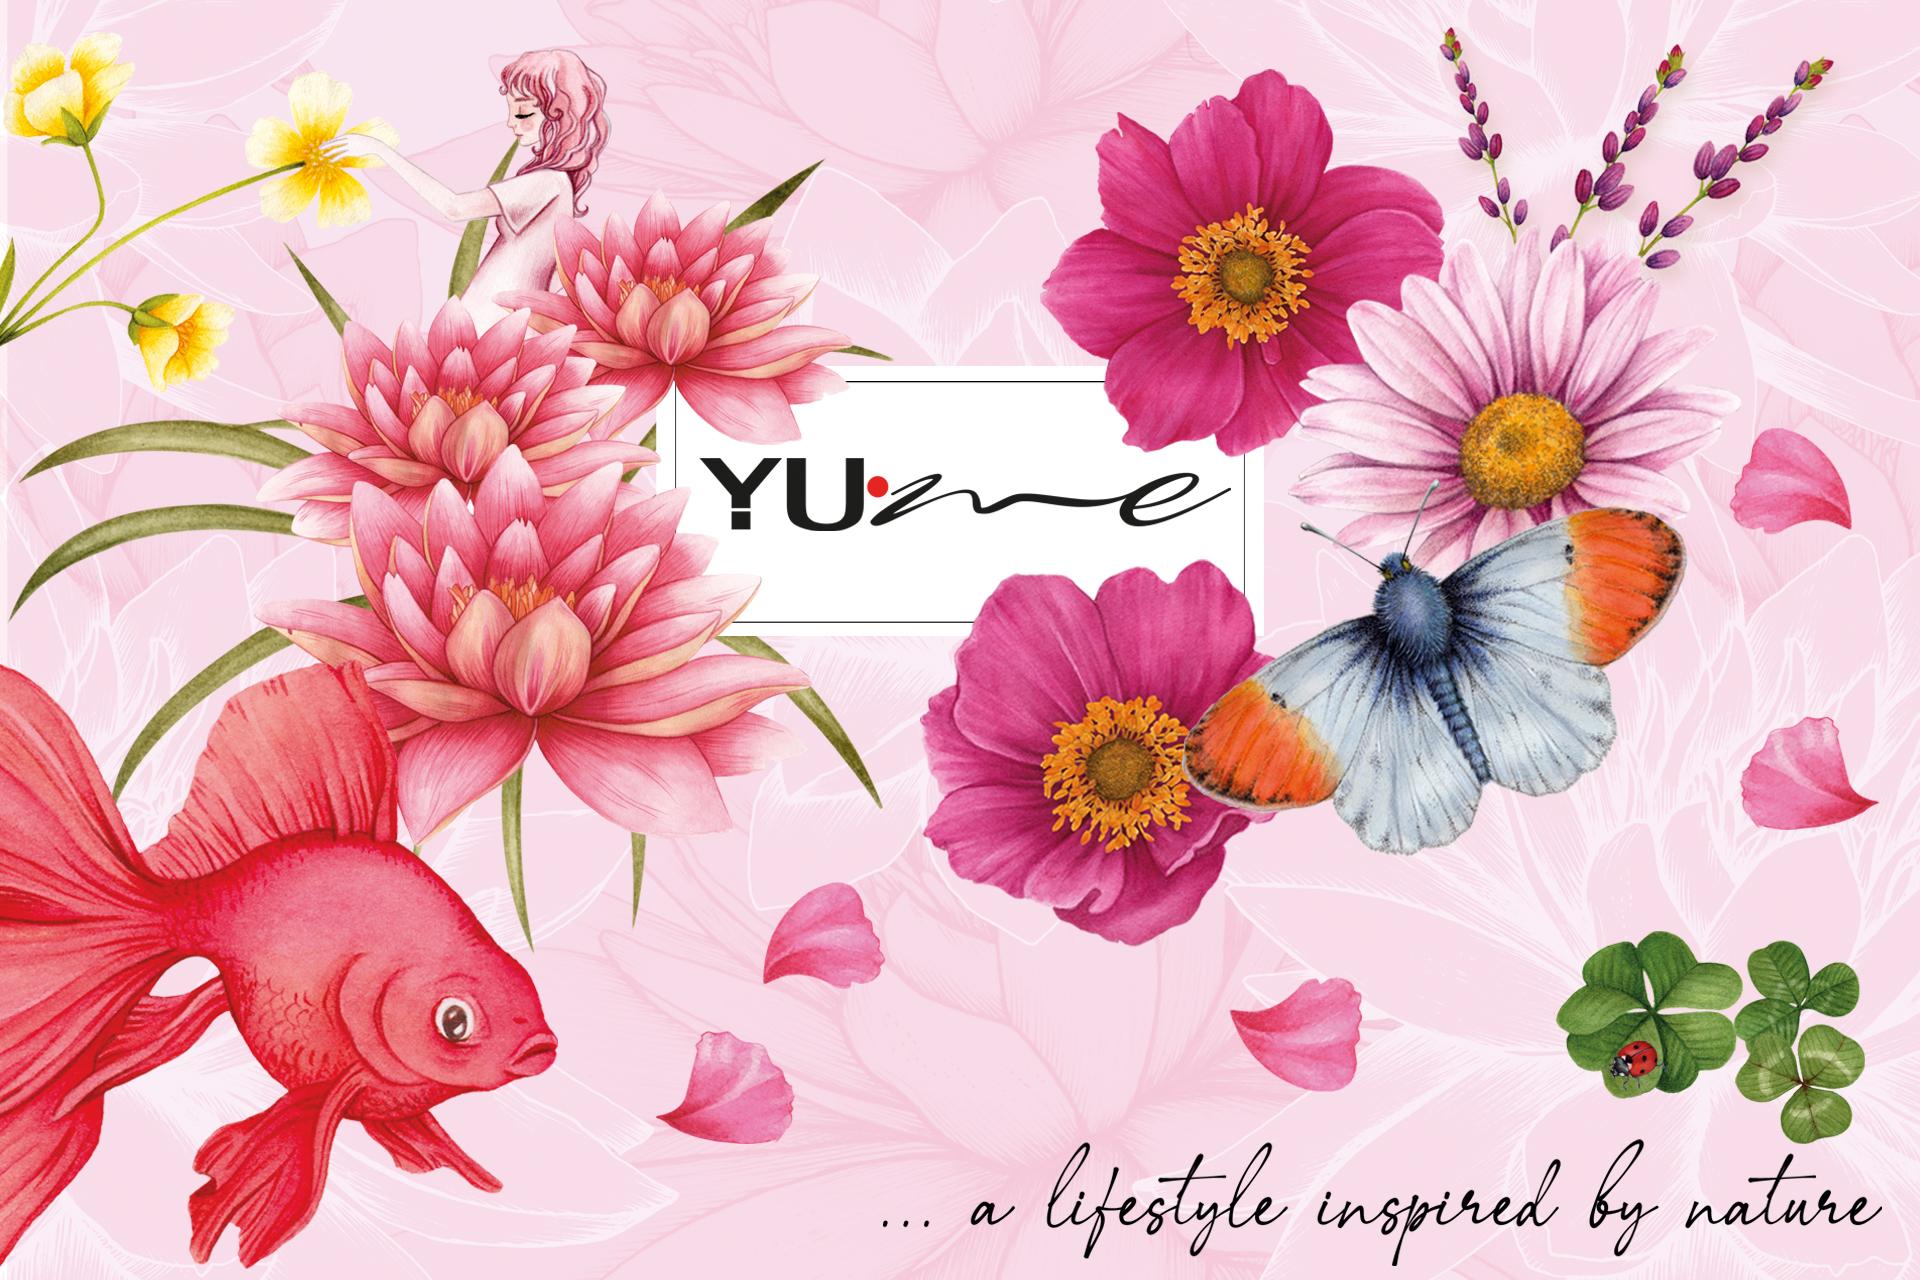 Yume Lifestyle brand